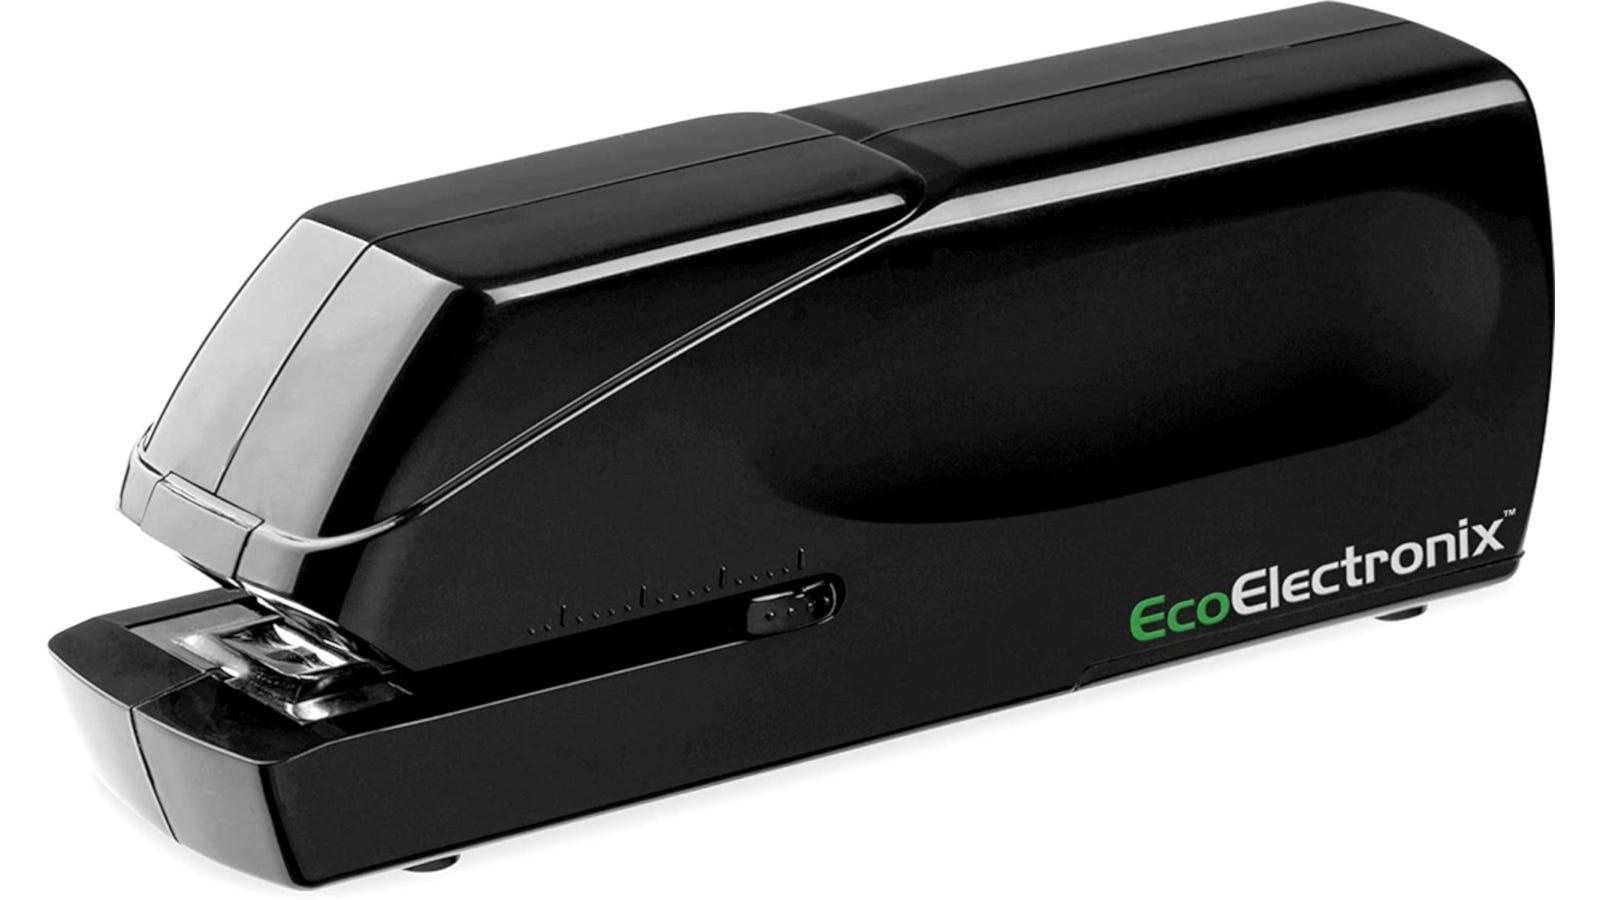 A black electric stapler.